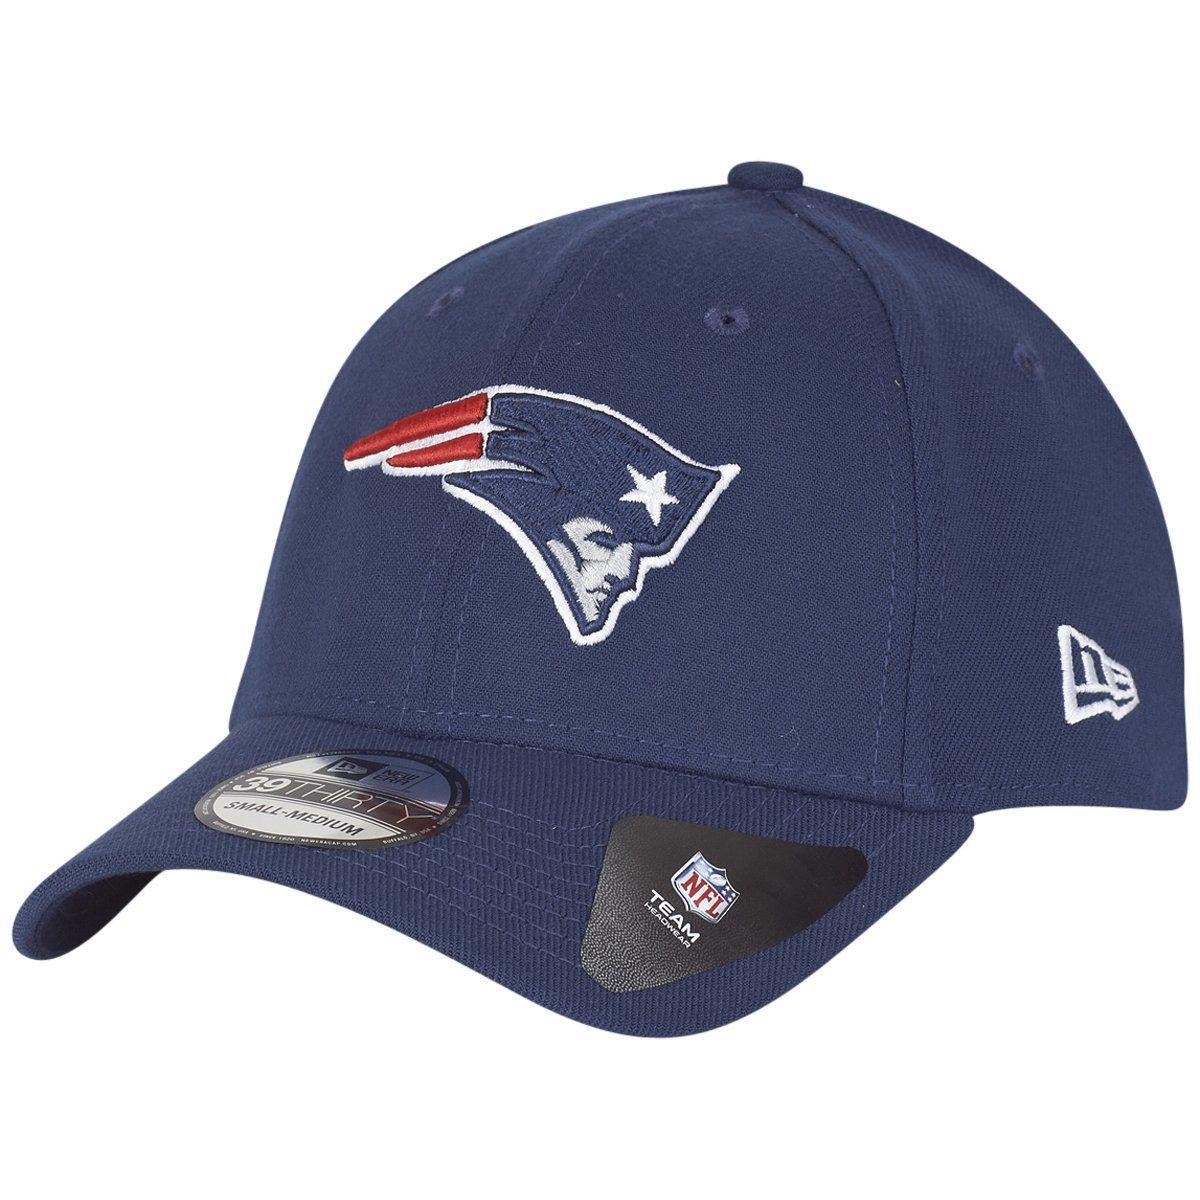 amfoo - New Era 39Thirty Stretch Cap - TEAM New England Patriots